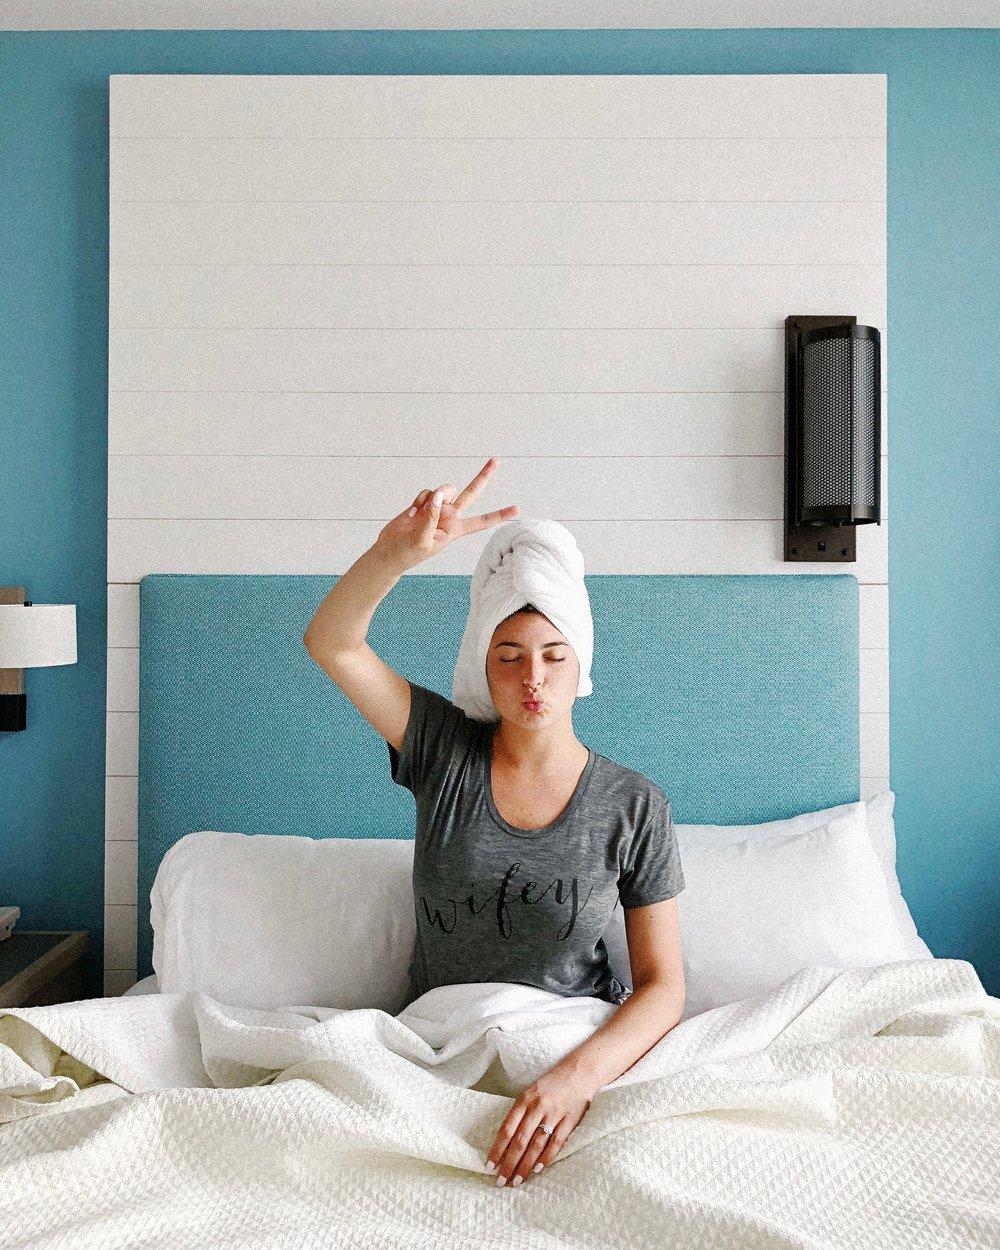 Hotel room towel wrap photo